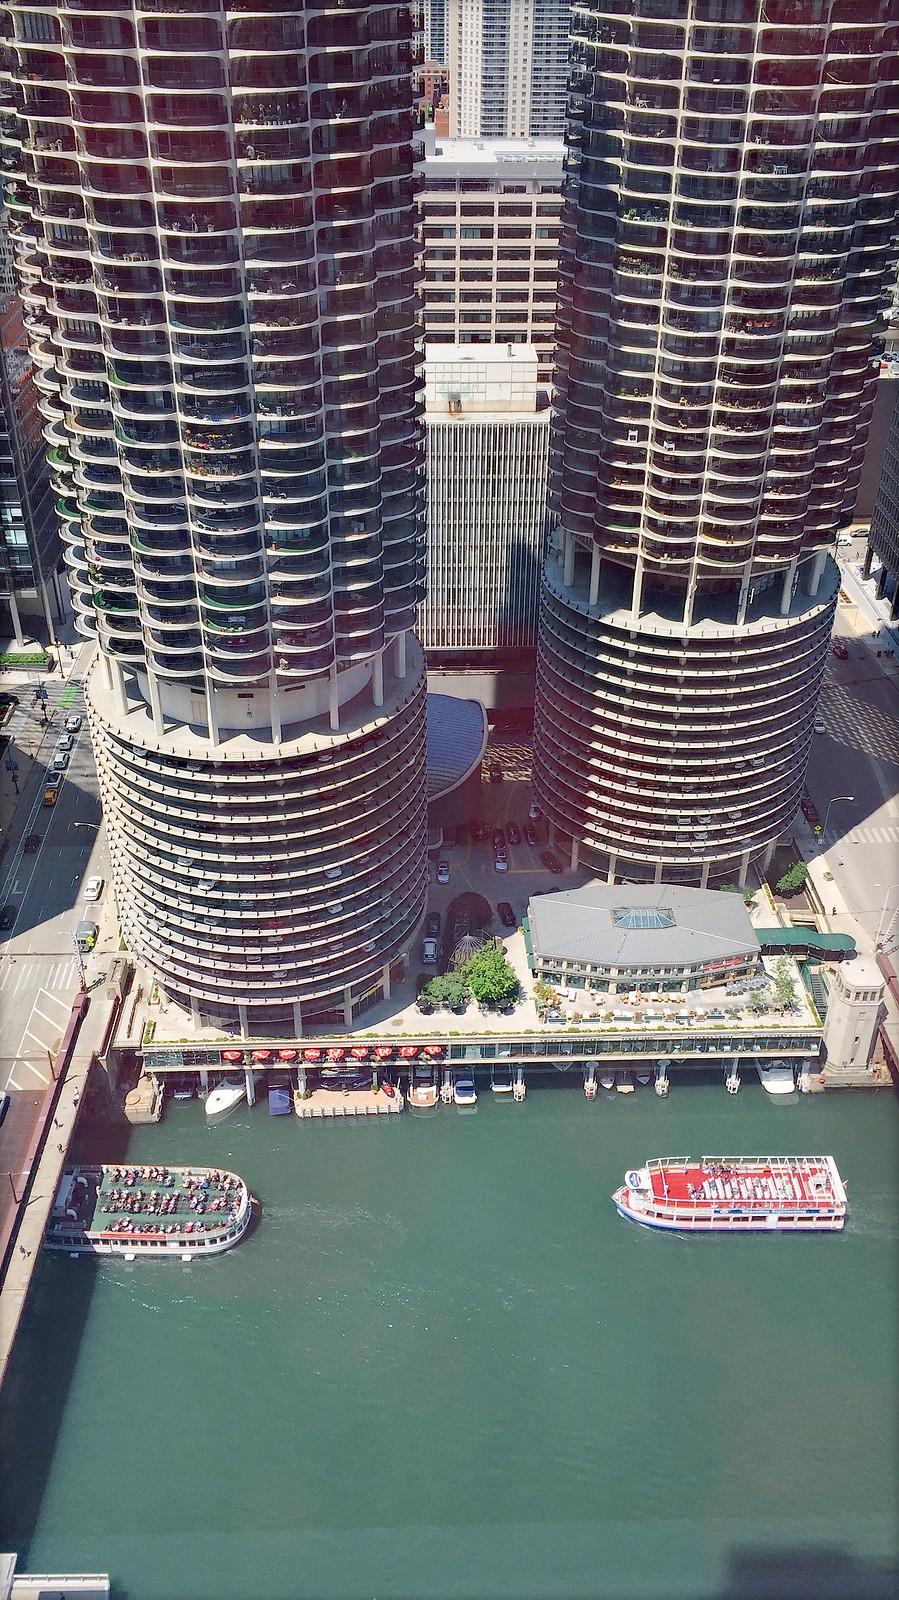 186/365. wilco towers.